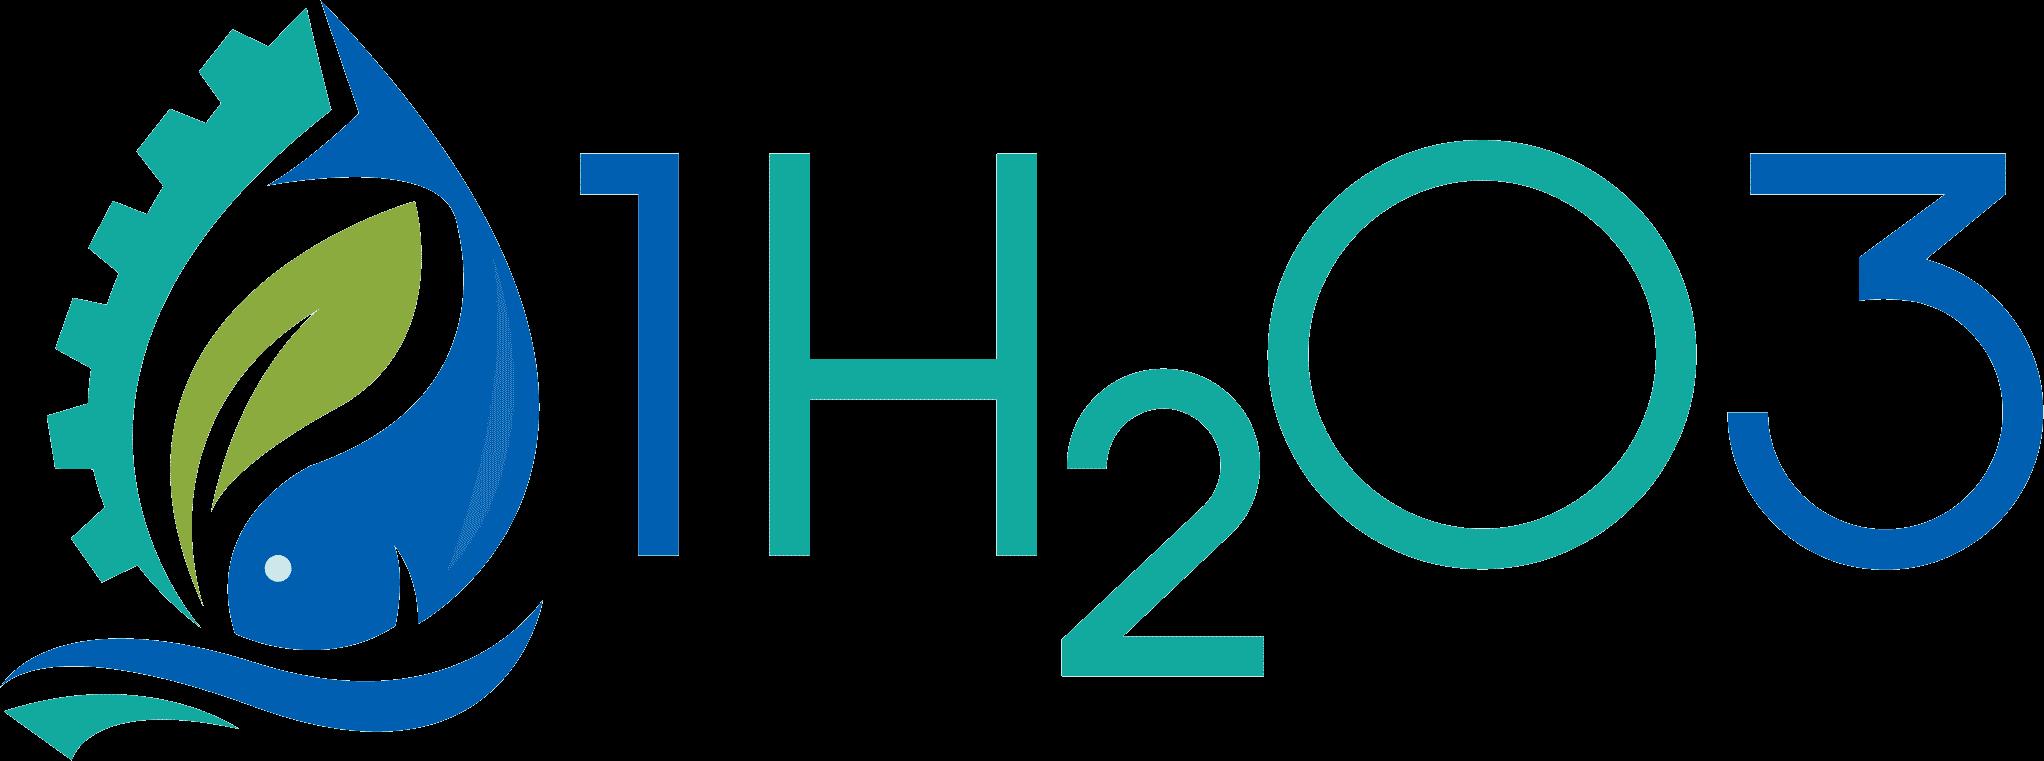 1 H2O 3